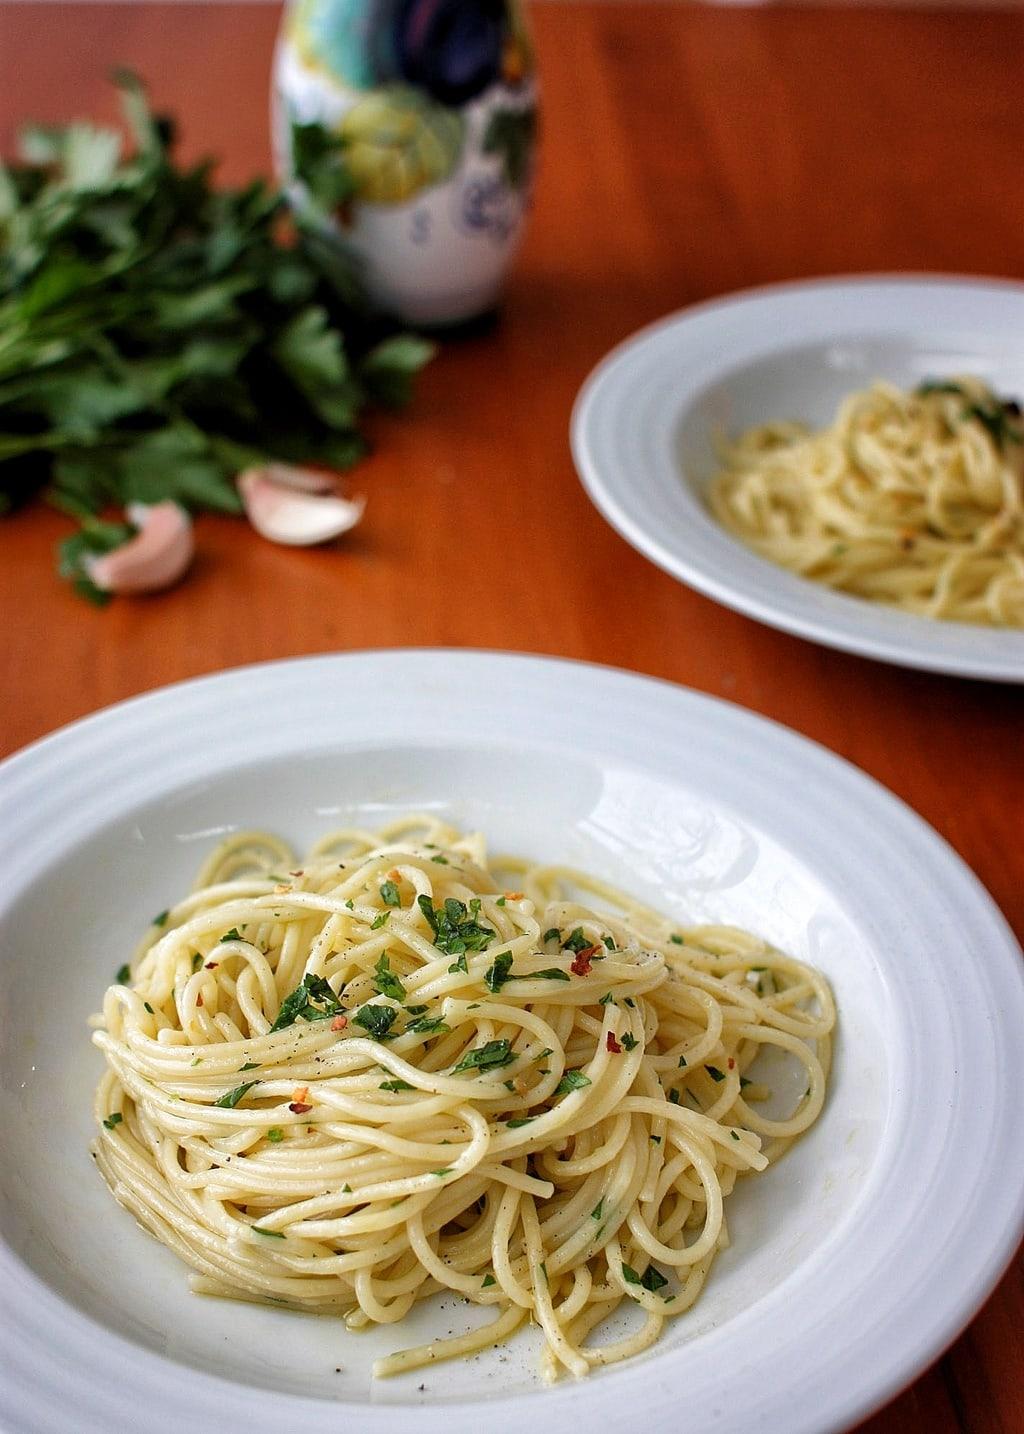 Spaghetti Aglio E Olio Dairy-Free Egg-Free #vegan | speedbumpkitchen.com